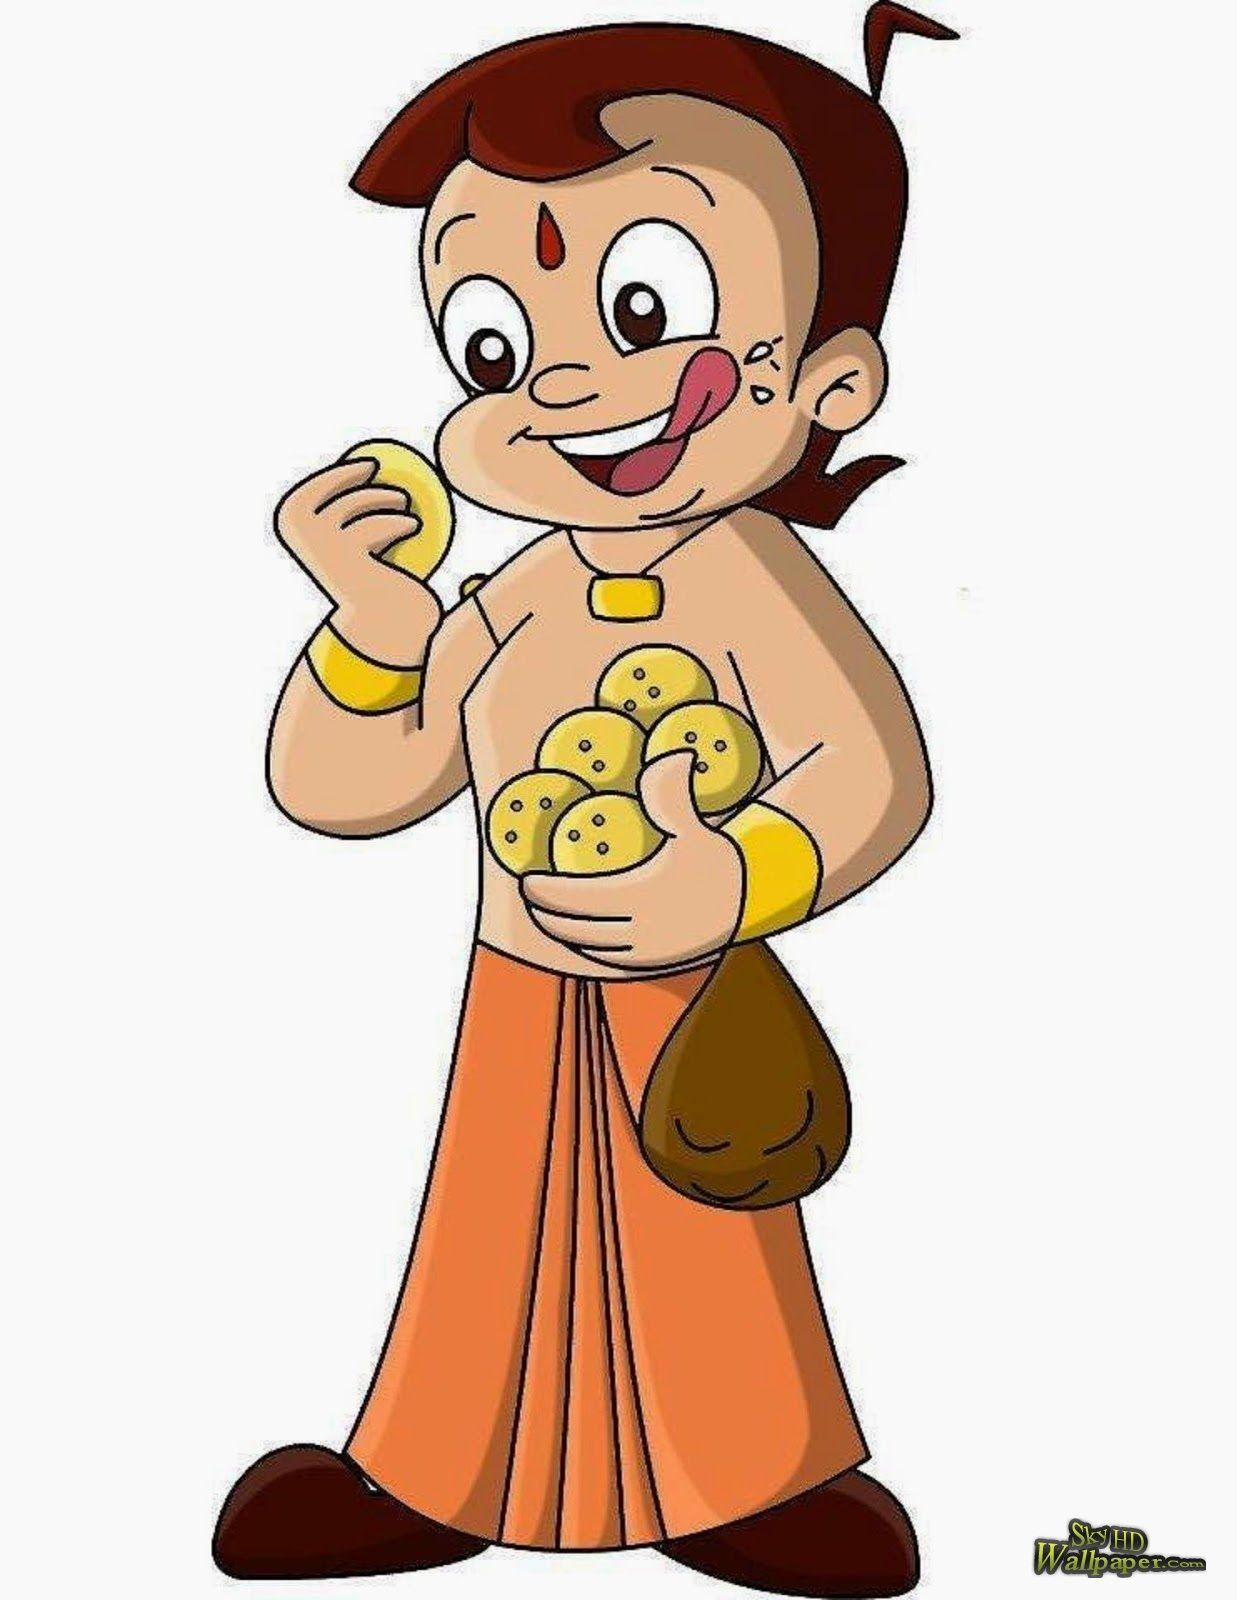 letest chhota bheem hd wallpapers free high definition cartoon bheem